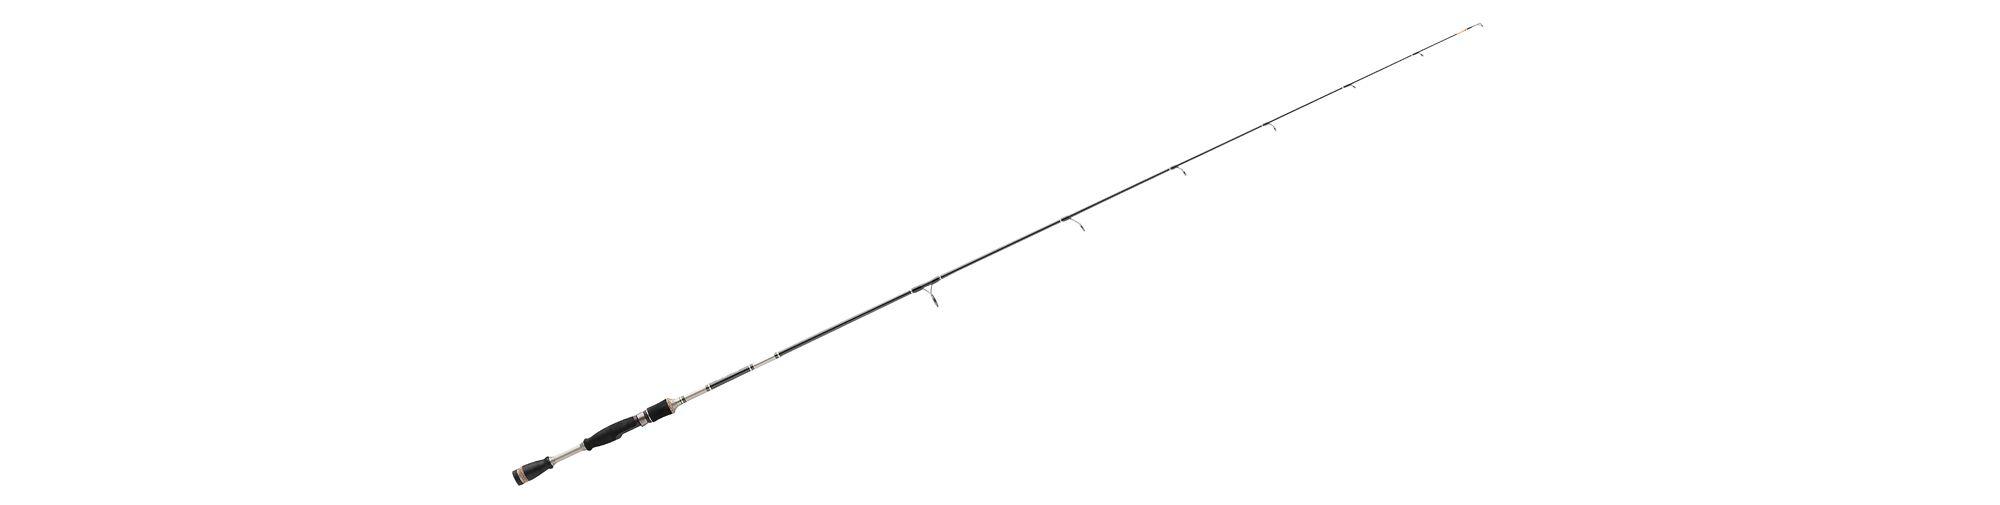 Yabai Fcy 601m 6 Medium 10 40